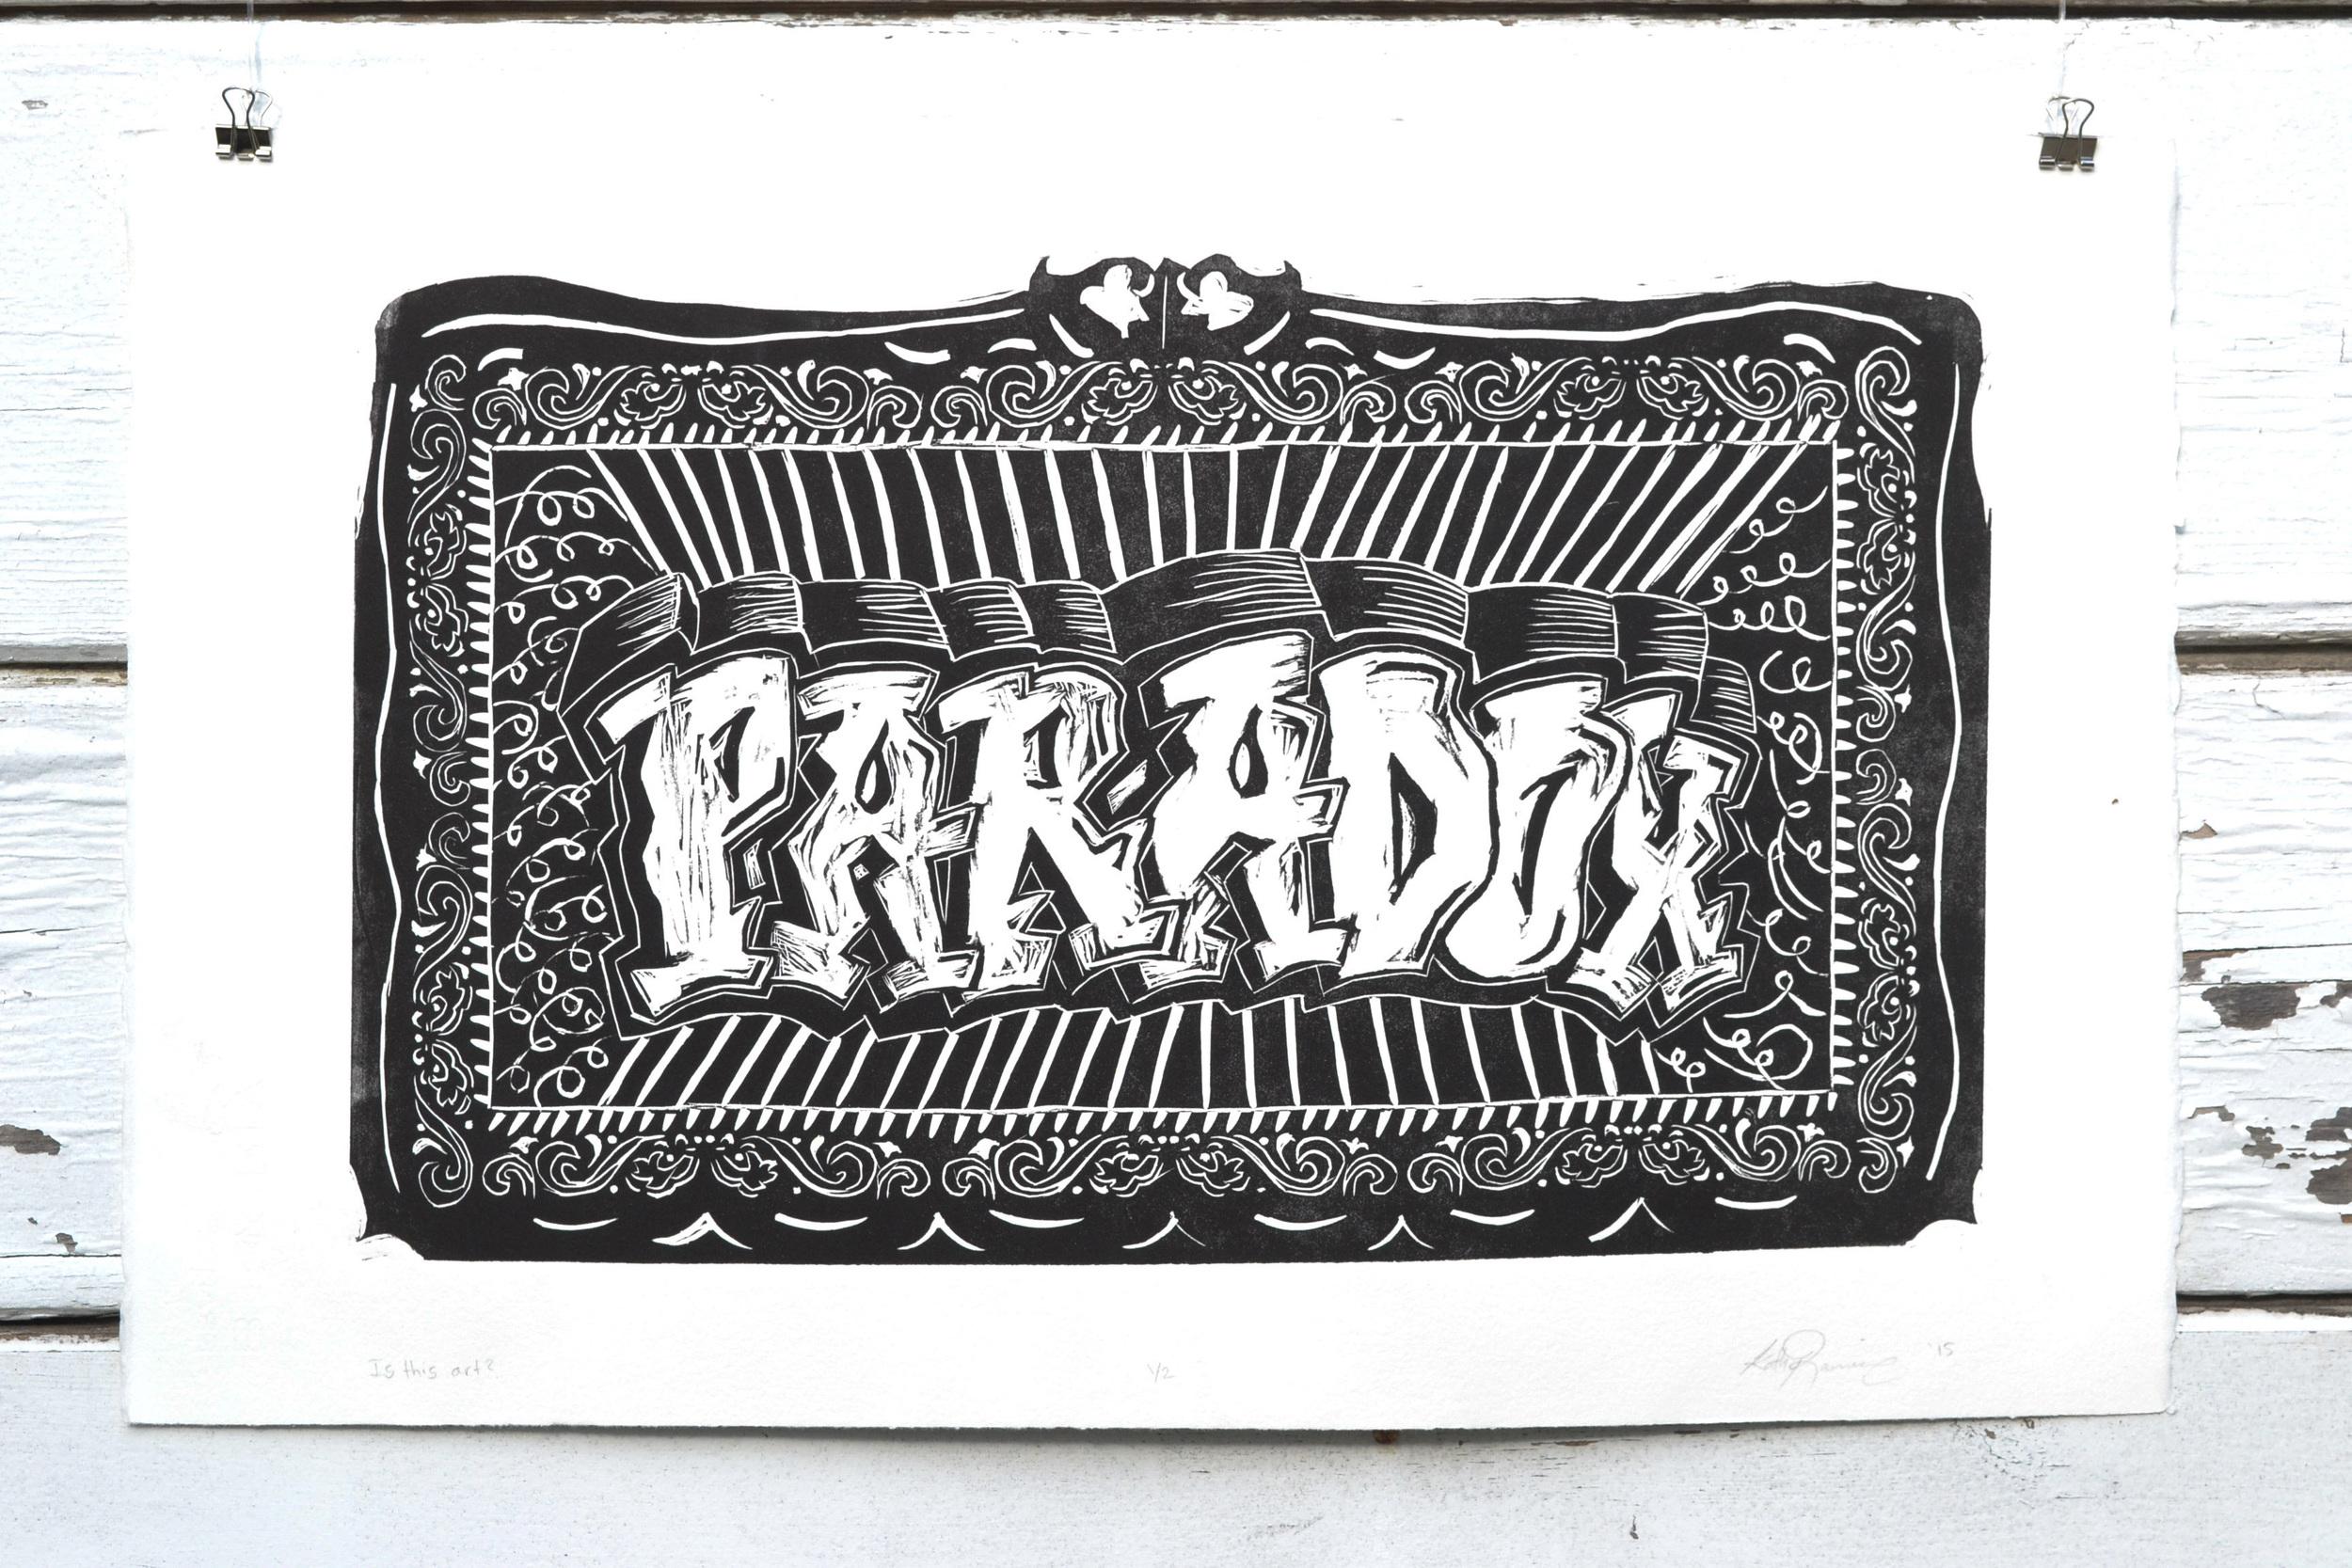 Miss-Kathy-Ramirez-Paradox-relief-print-black-and-white.jpg